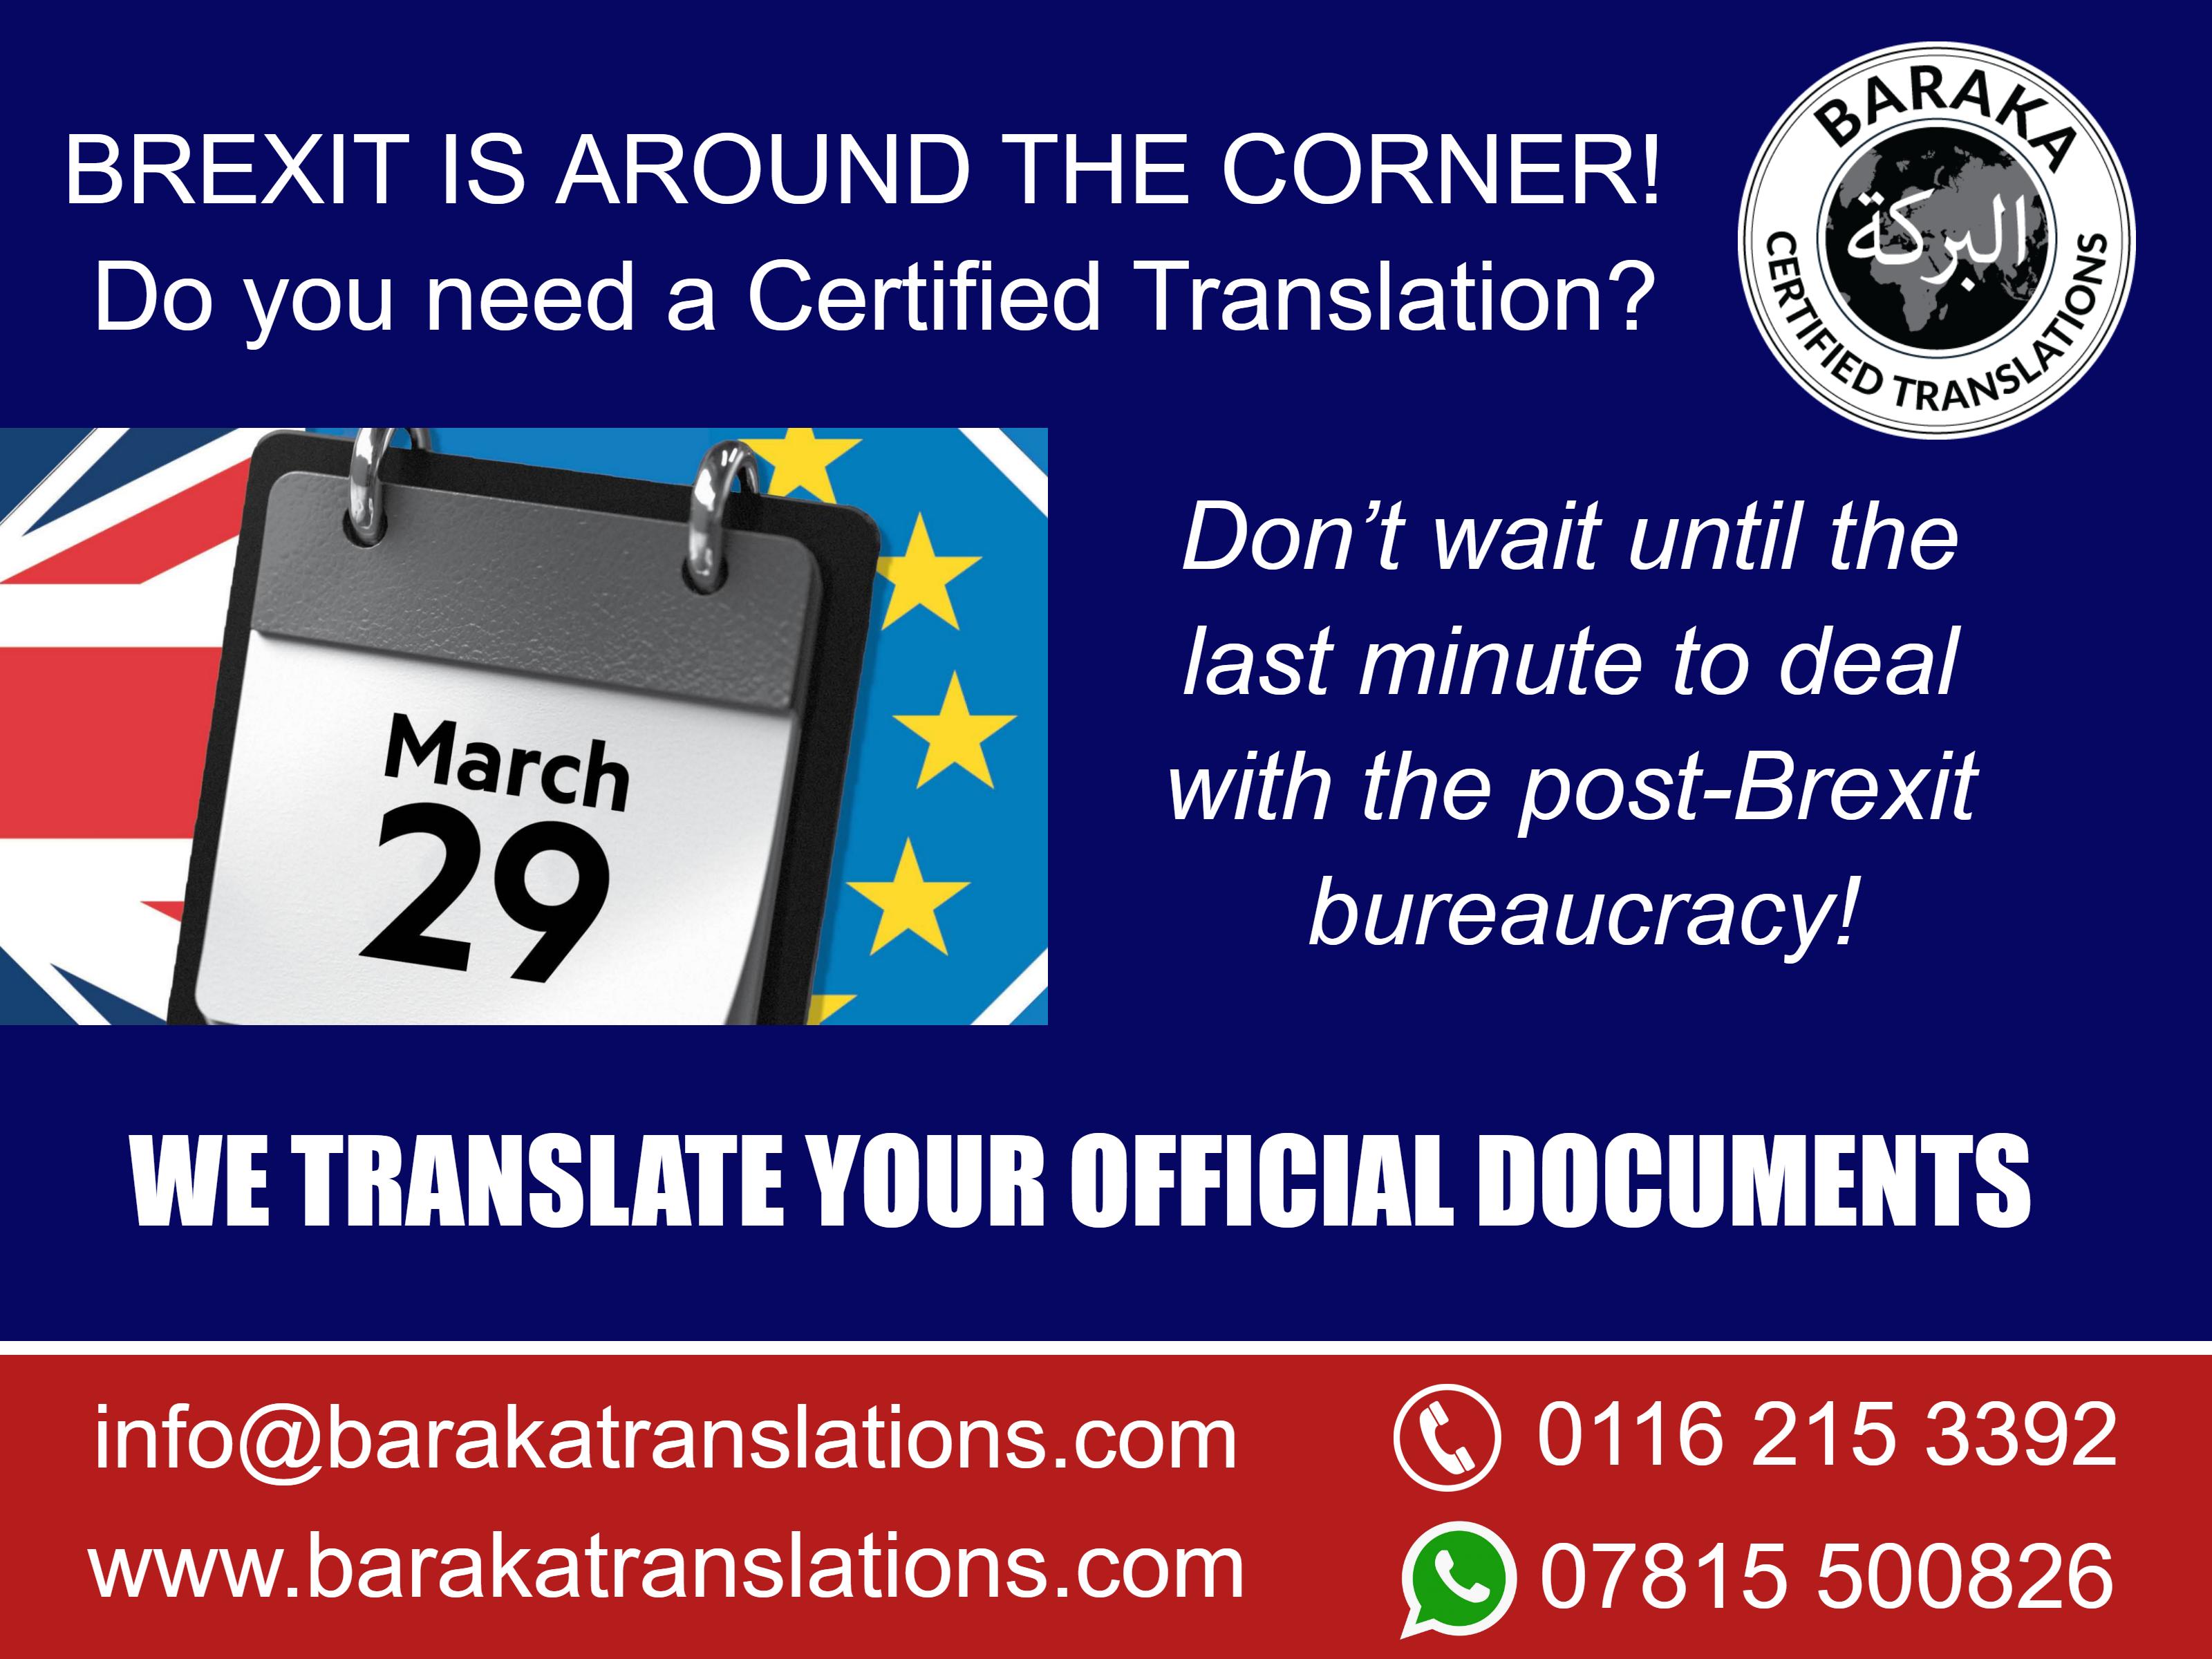 brexit poster jan 19.png